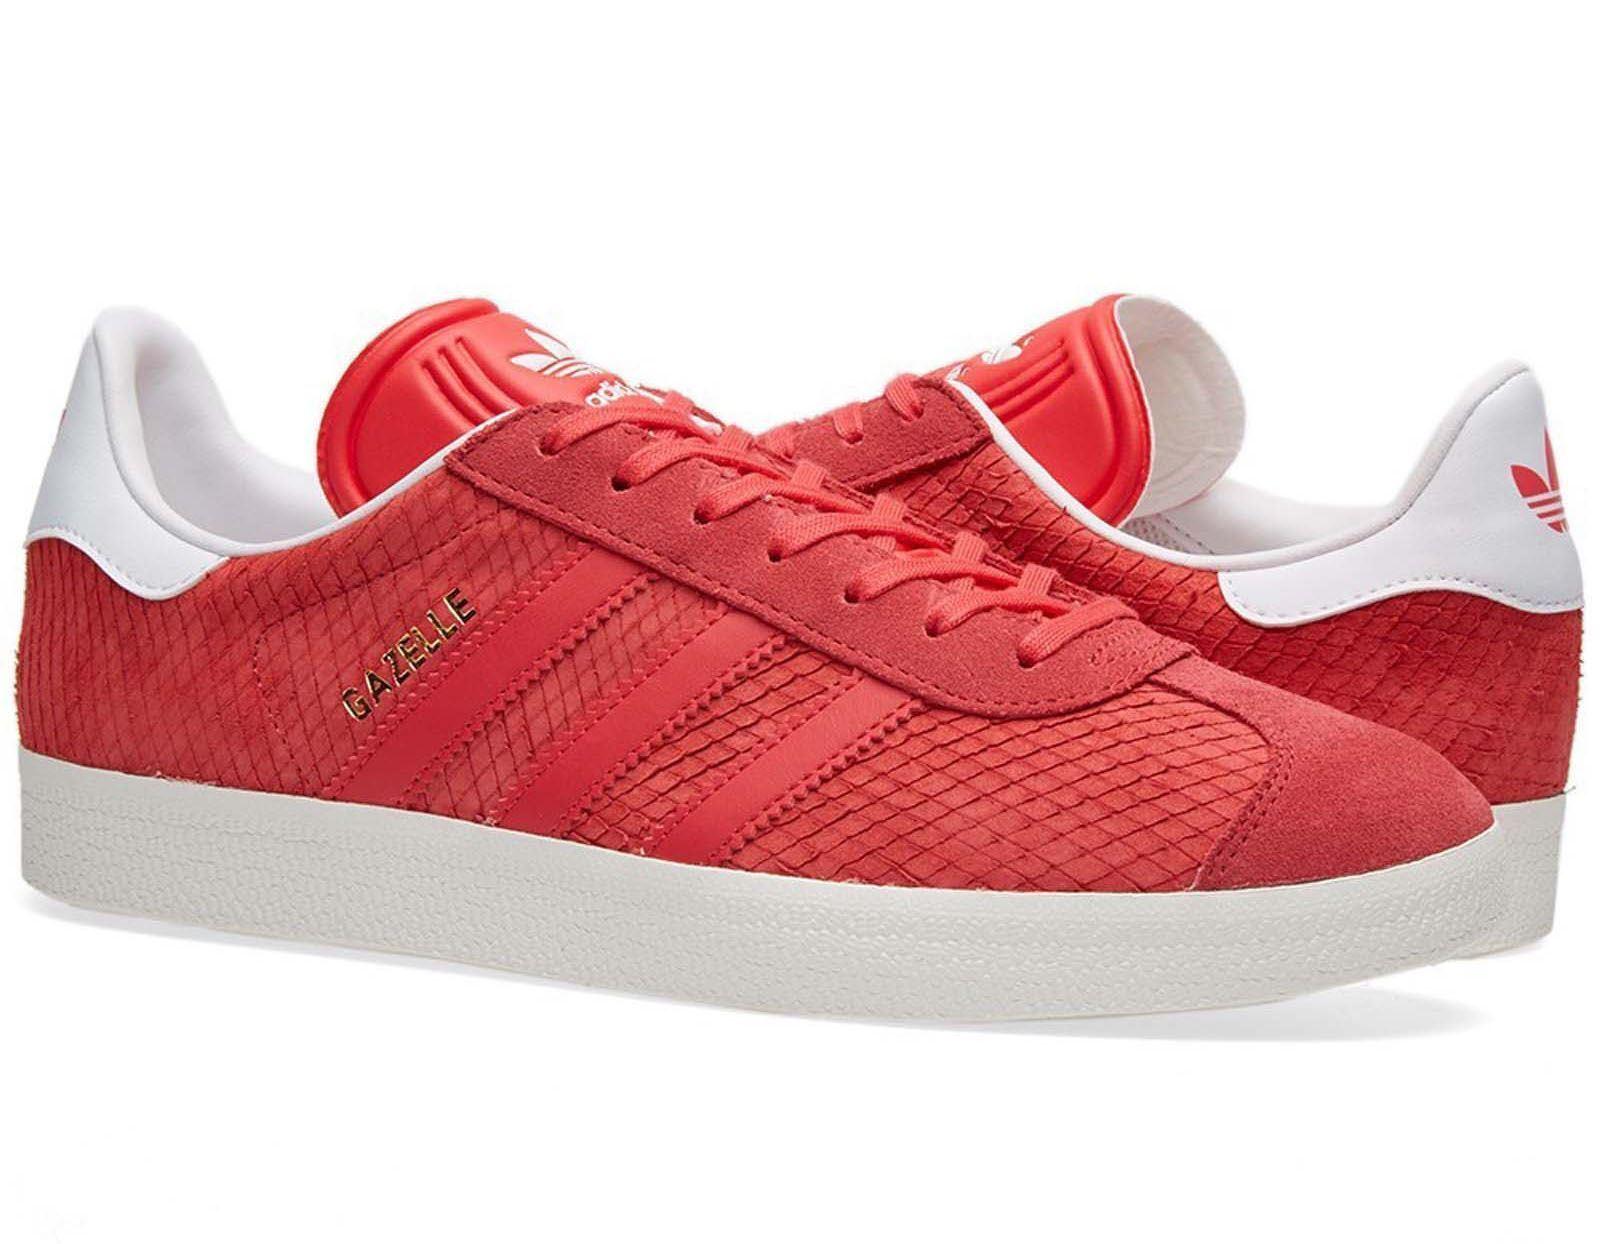 Adidas Gazelle W Neu Original Damen Sneaker Schuhe Training Original Neu BB5174 Gr:37 1/3 44defe